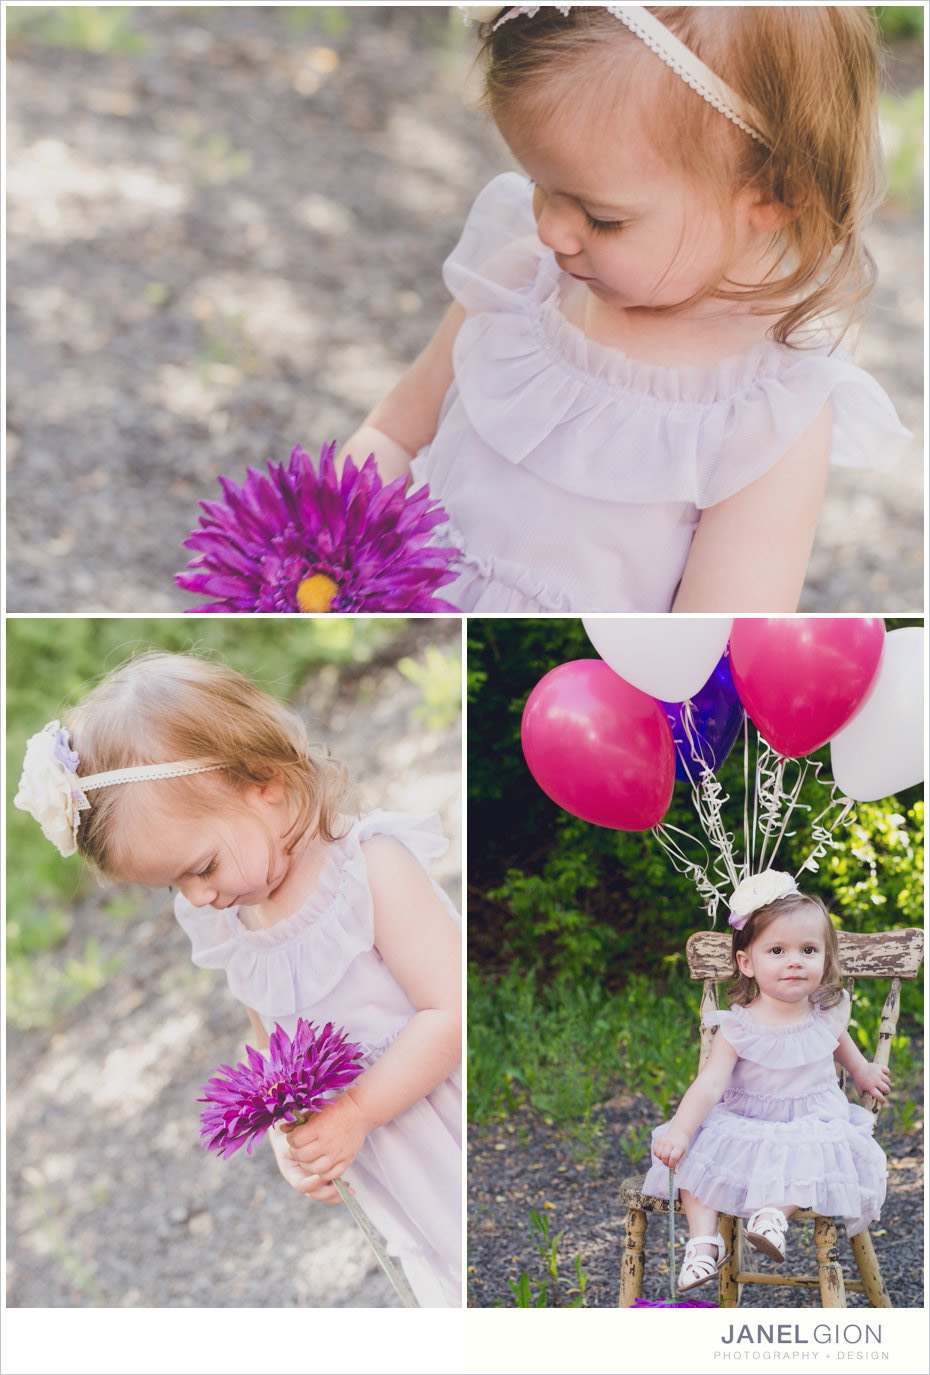 Janel-Gion-toddler-girl-balloon-photos_00021.jpg